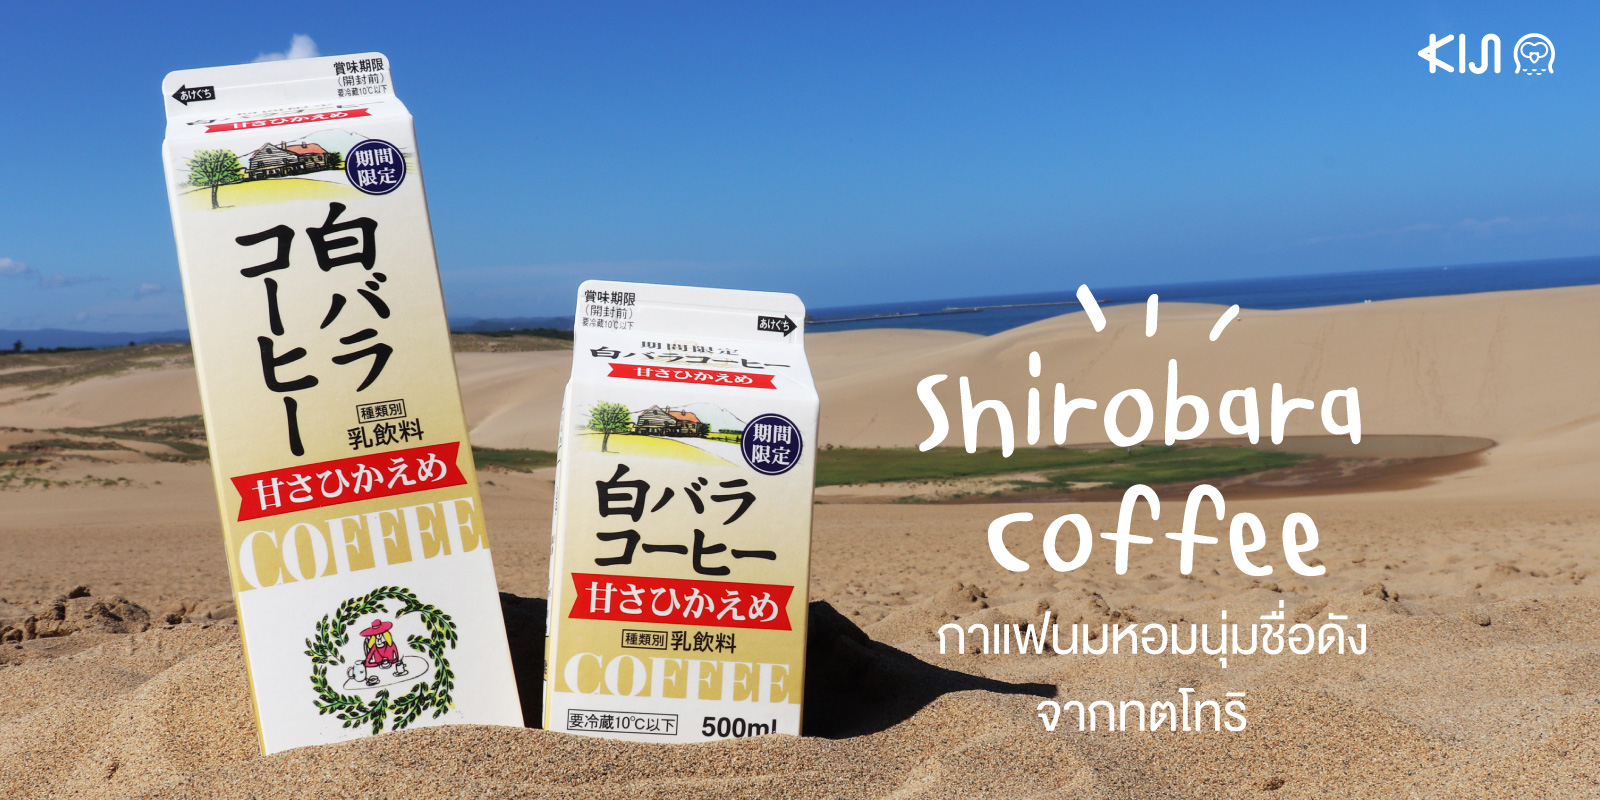 Shirobara Coffee กาแฟนมชื่อดัง ทตโทริ